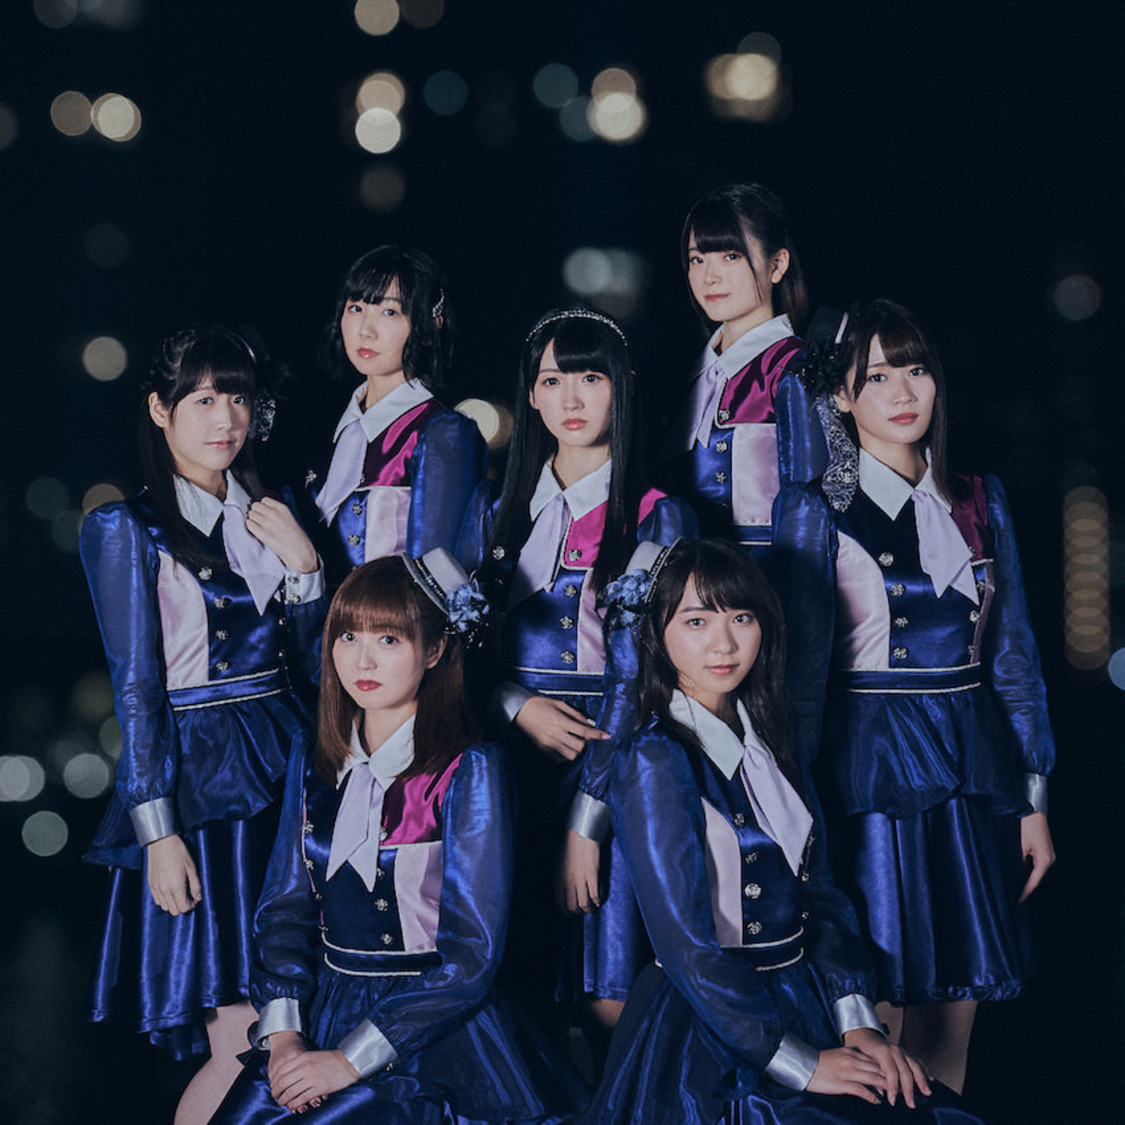 転校少女*、岡田夢以を含む現7人体制最後の特典会 開催決定!